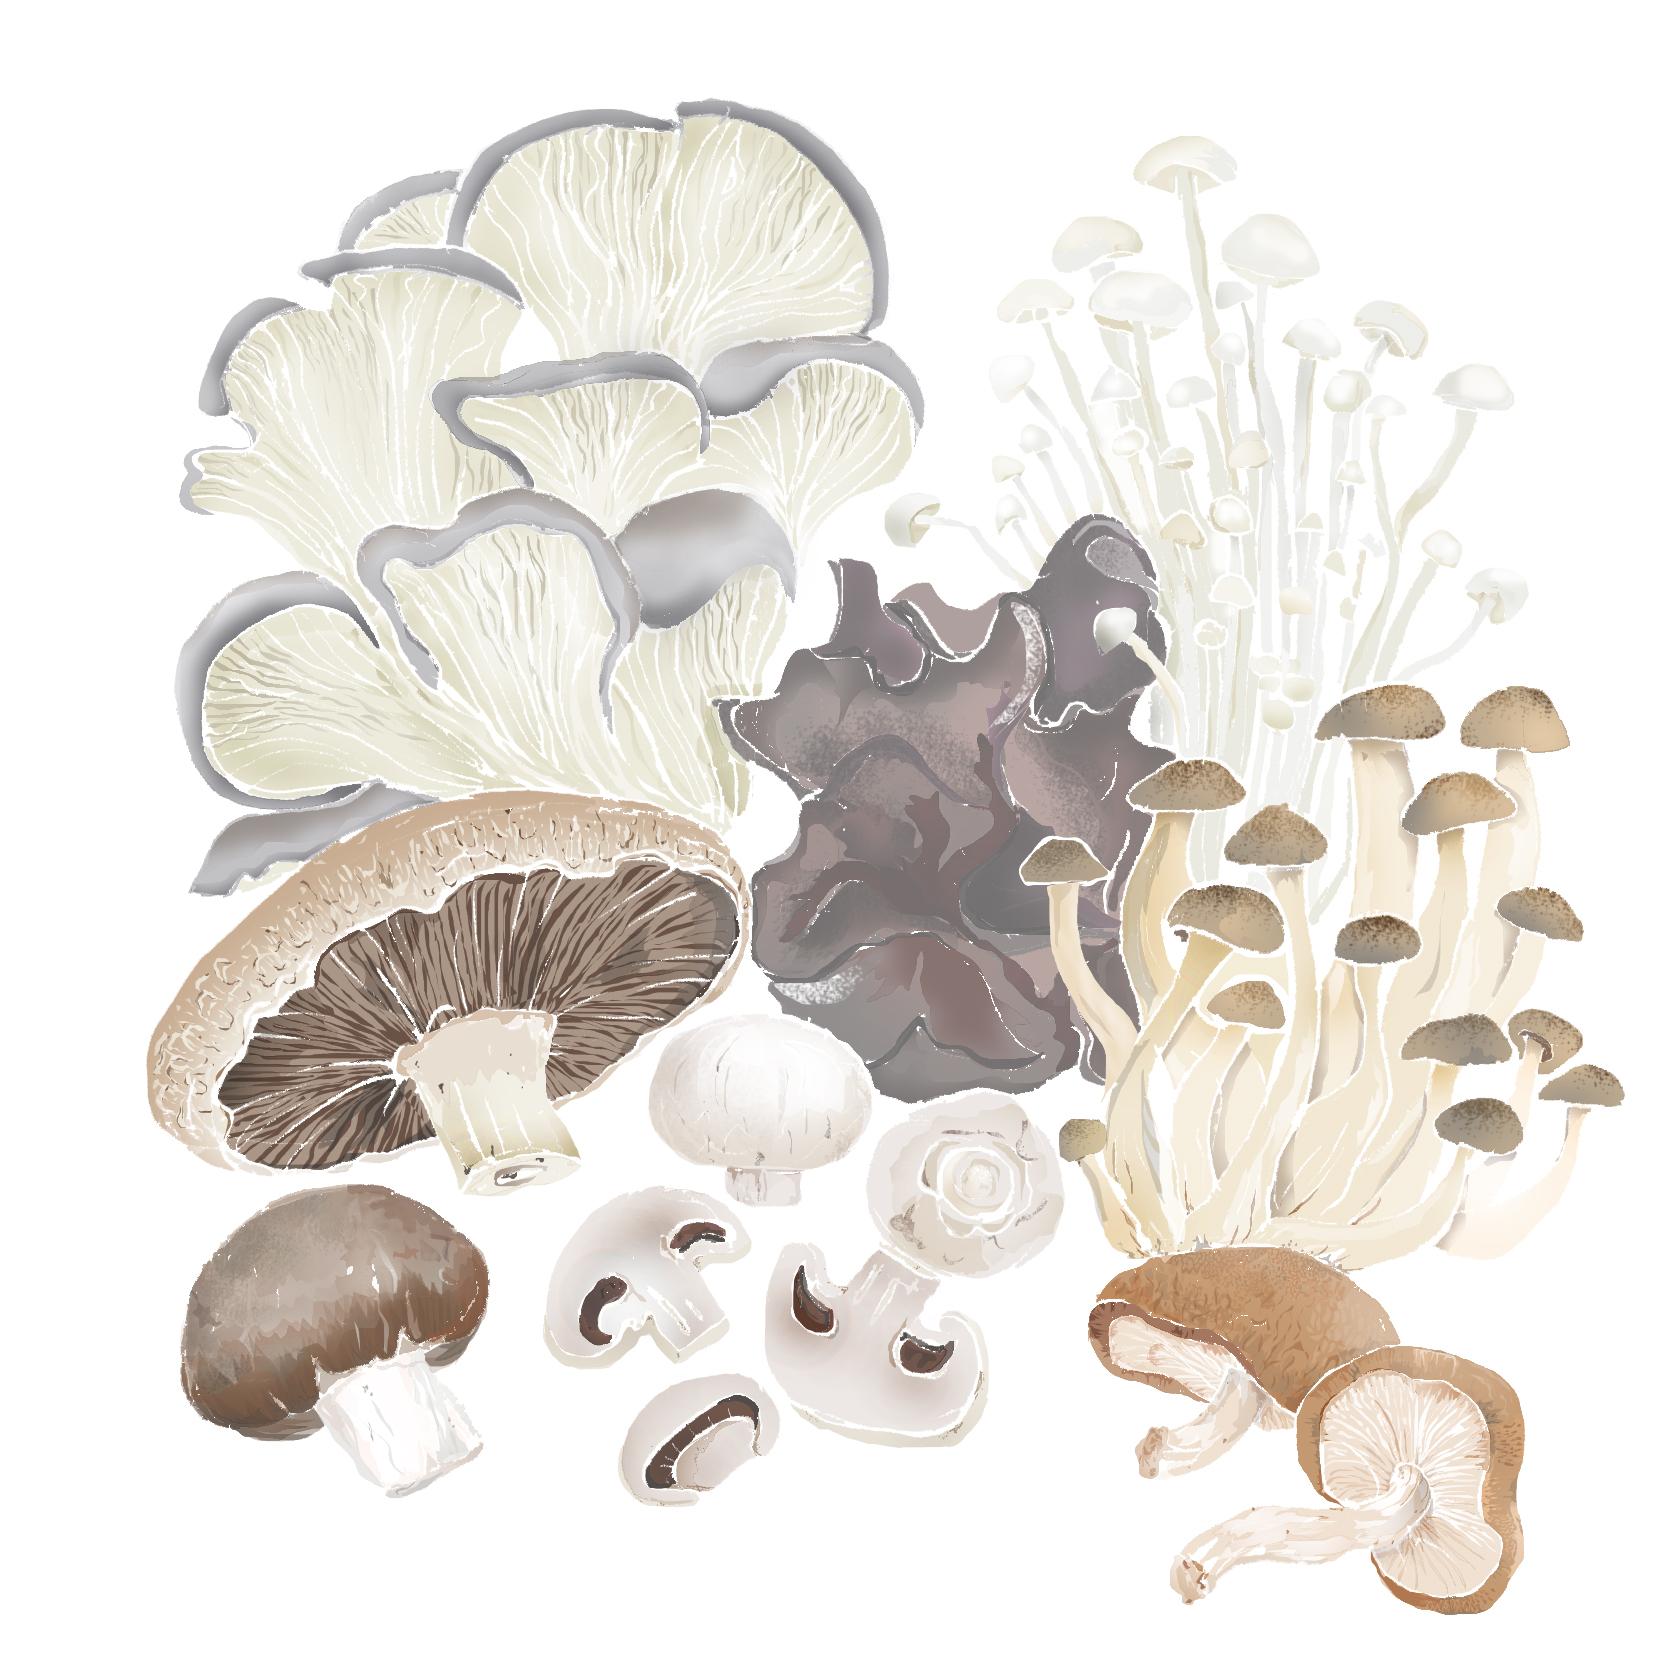 M - Mushrooms